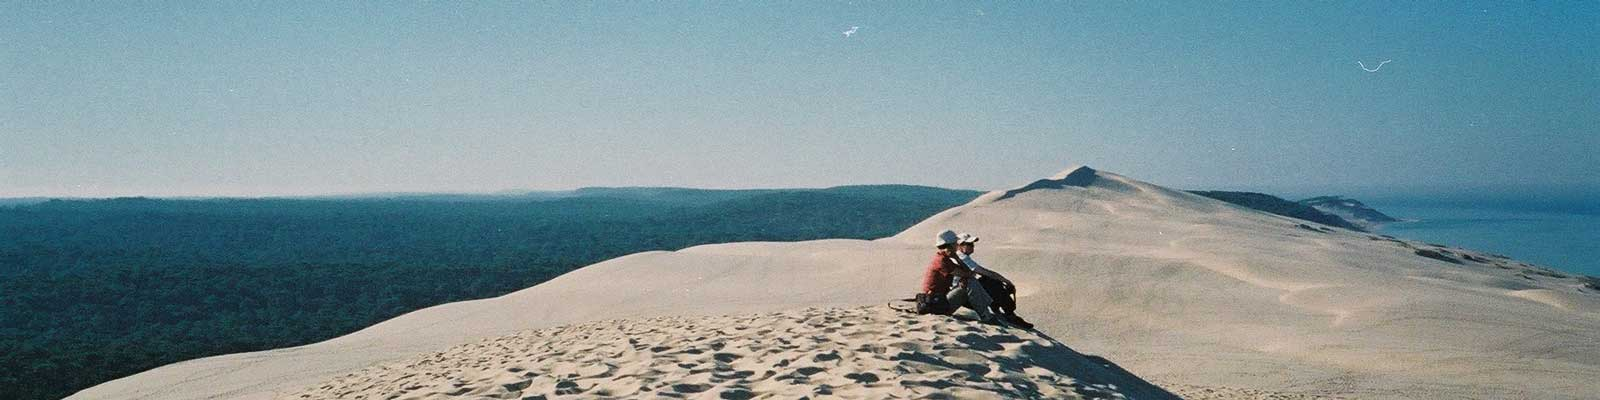 location camping proche dune du pyla